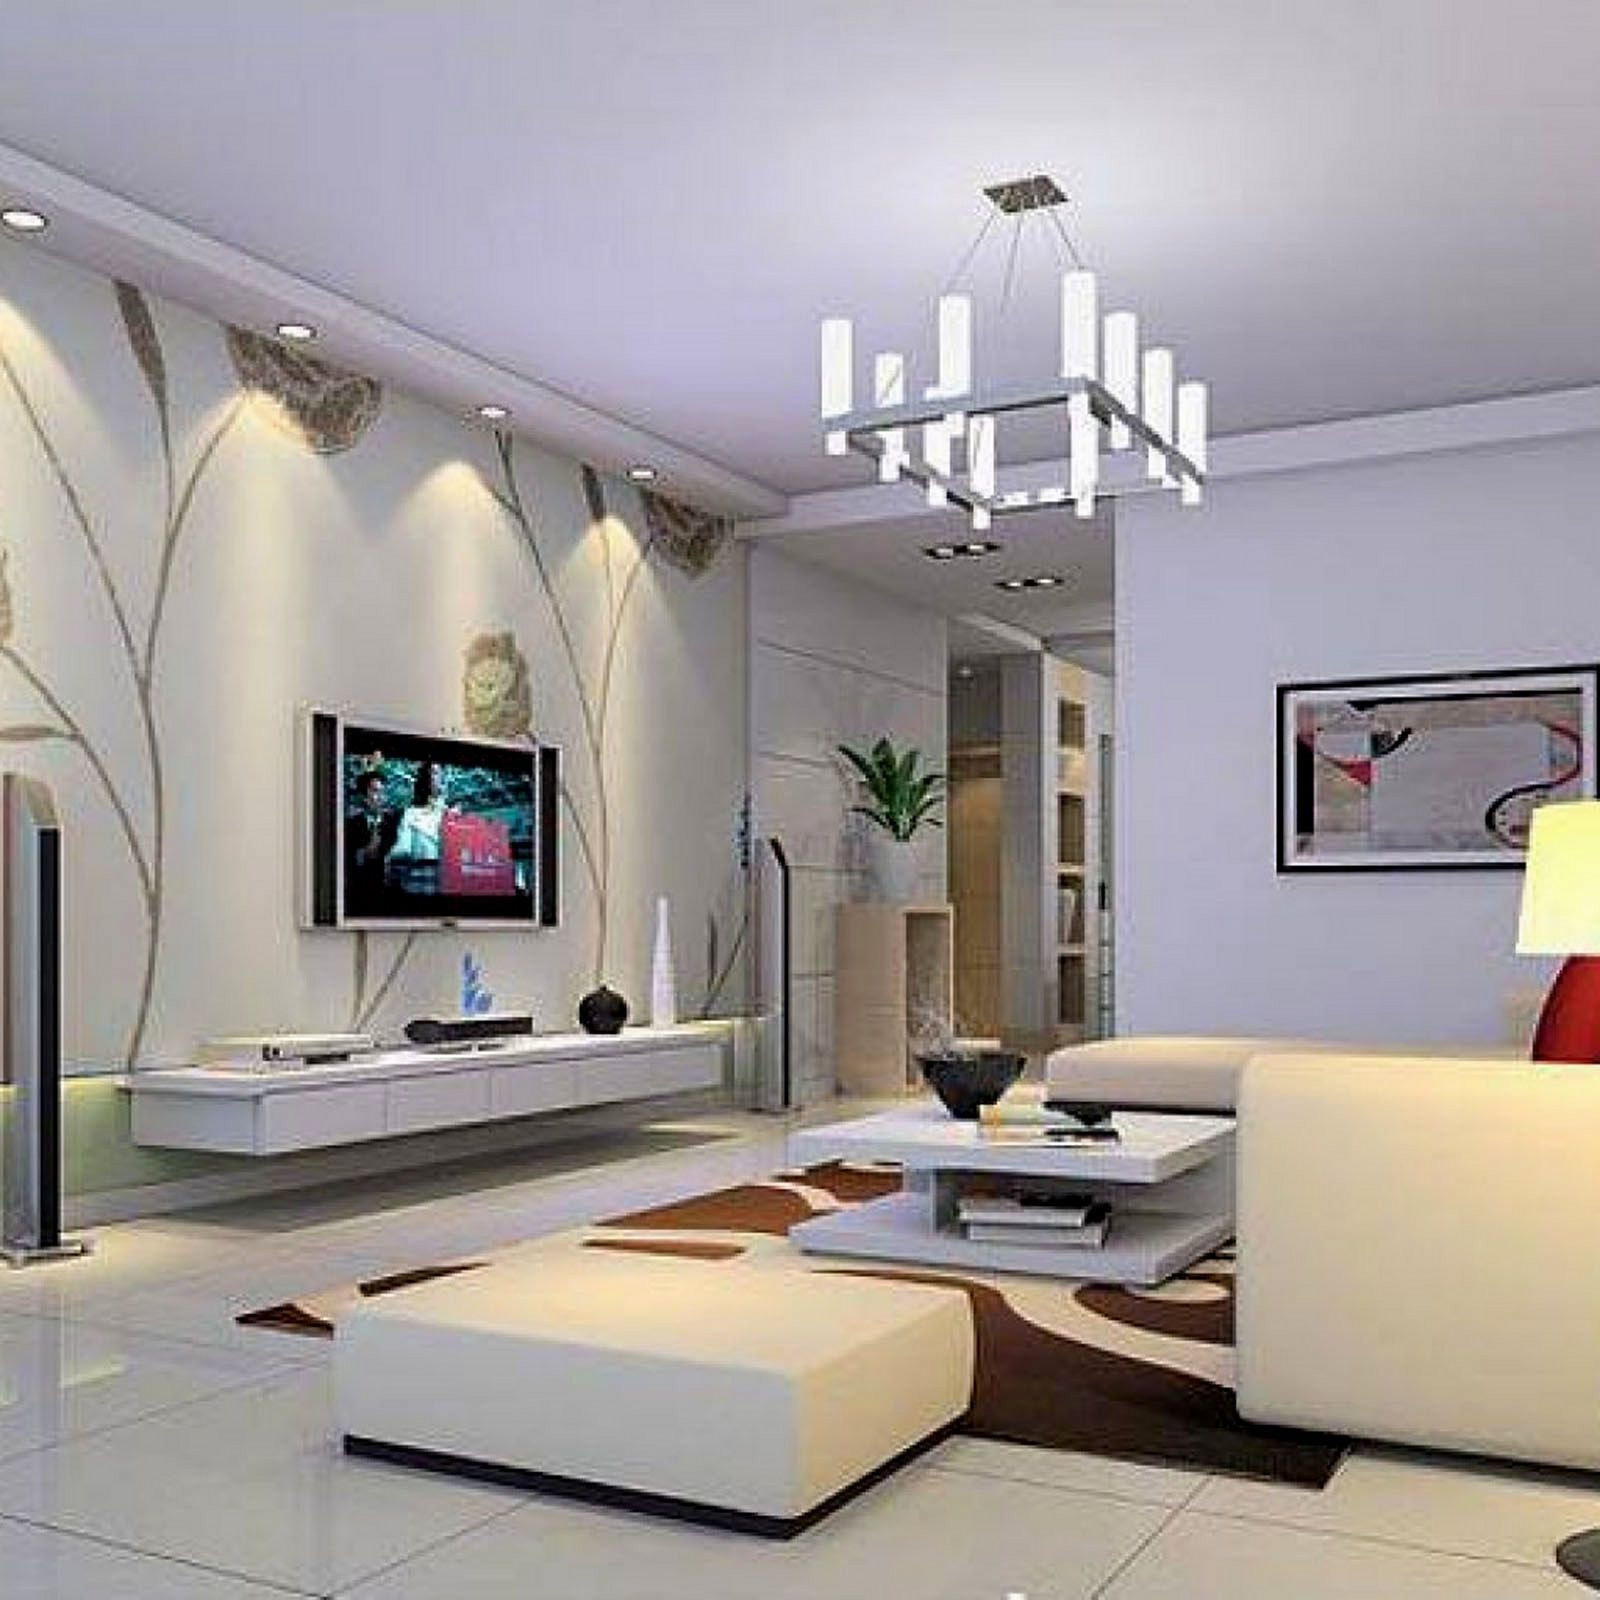 Top 20 Low Budget Living Room Ideas To Decor Your Living Room Smart Living Room Small House Interior Design Living Room Decor Apartment